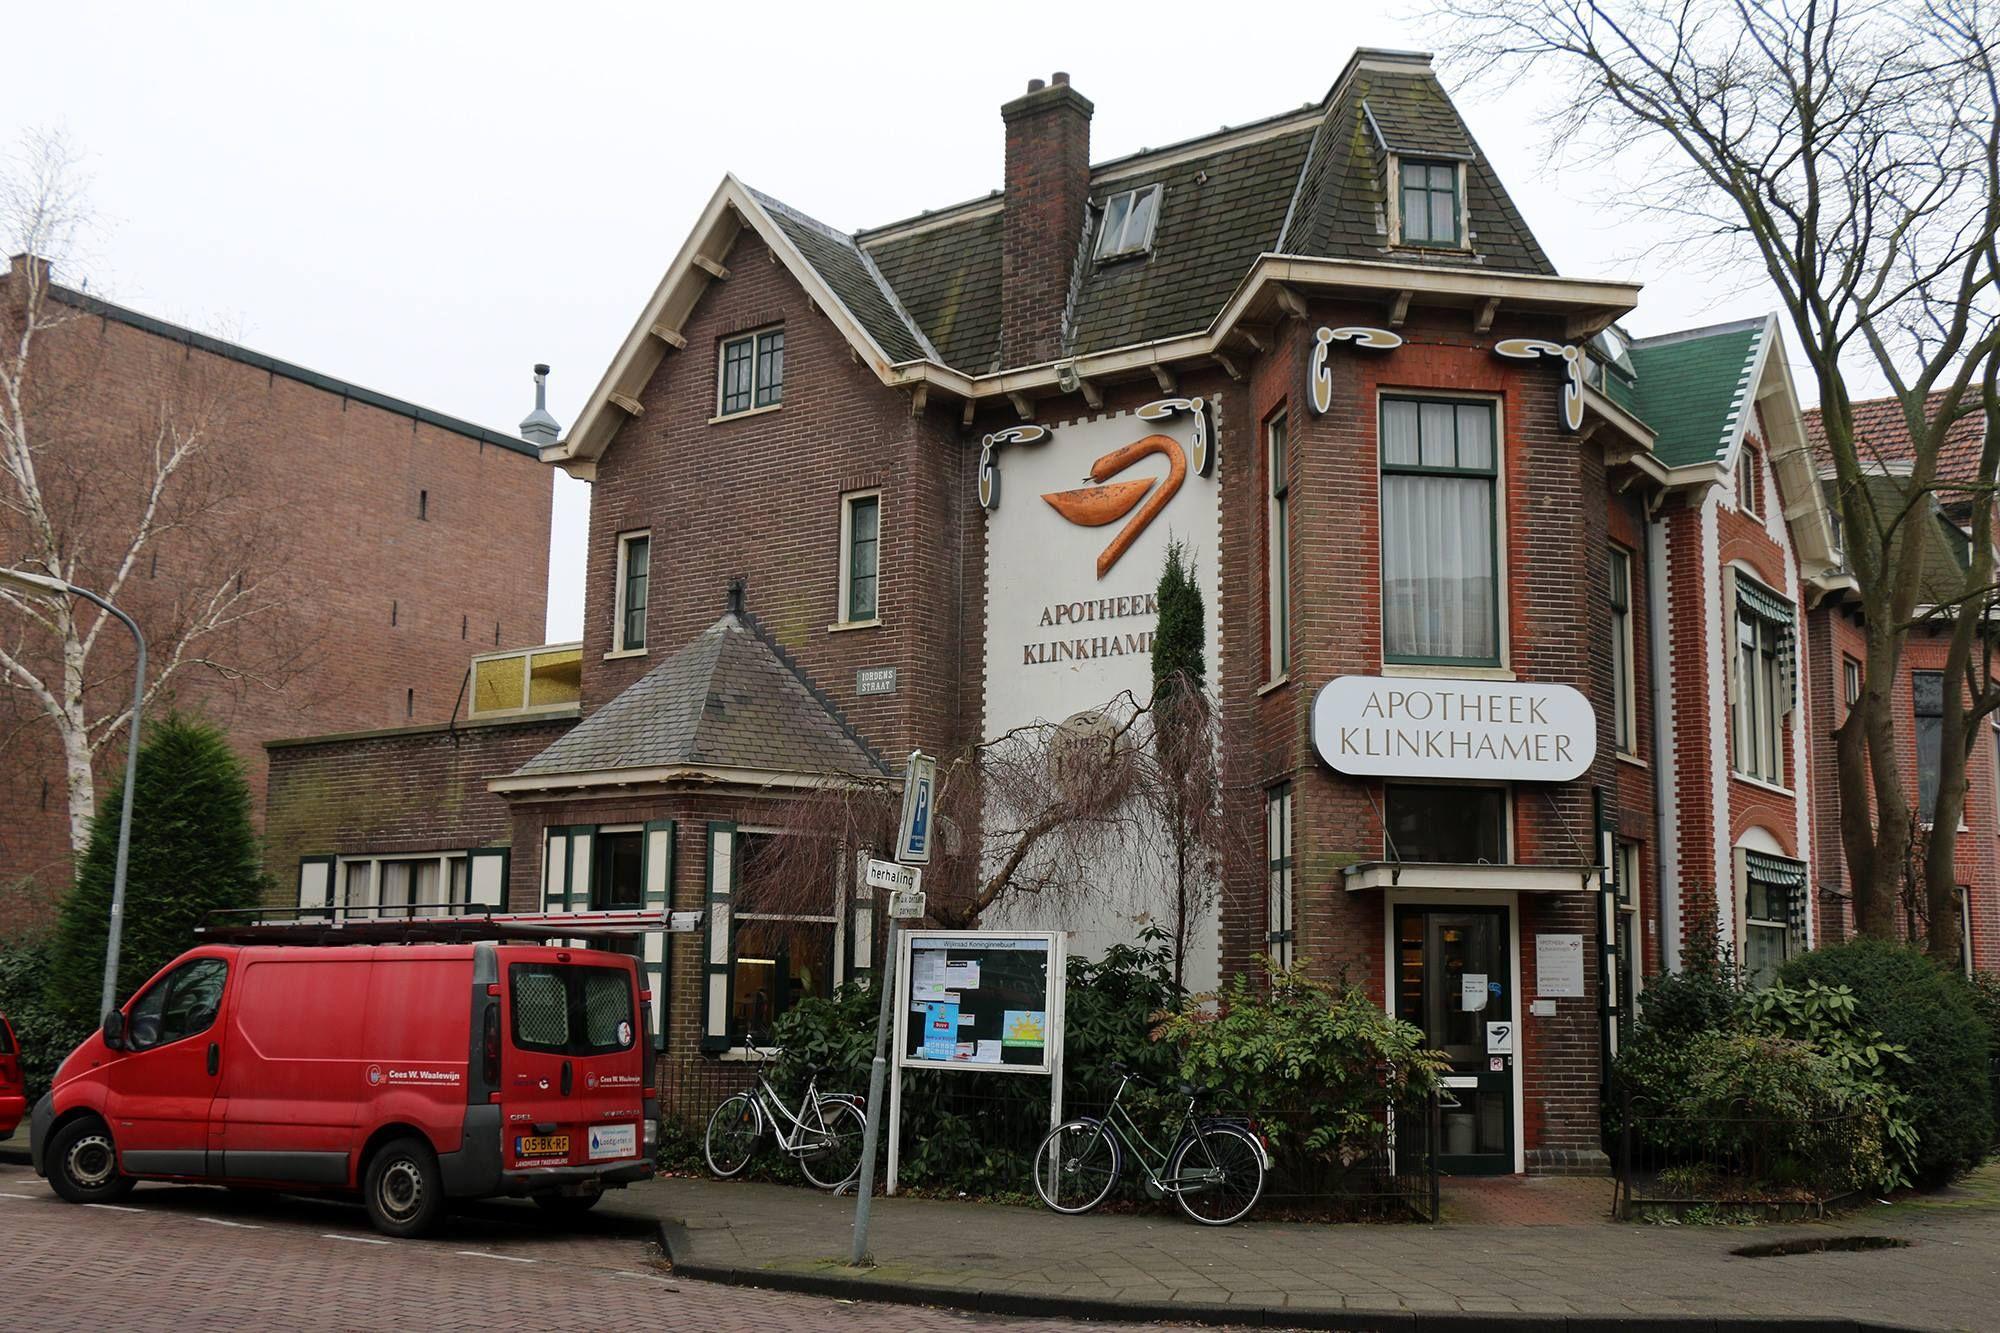 Apotheek Klinkhamer, Haarlem